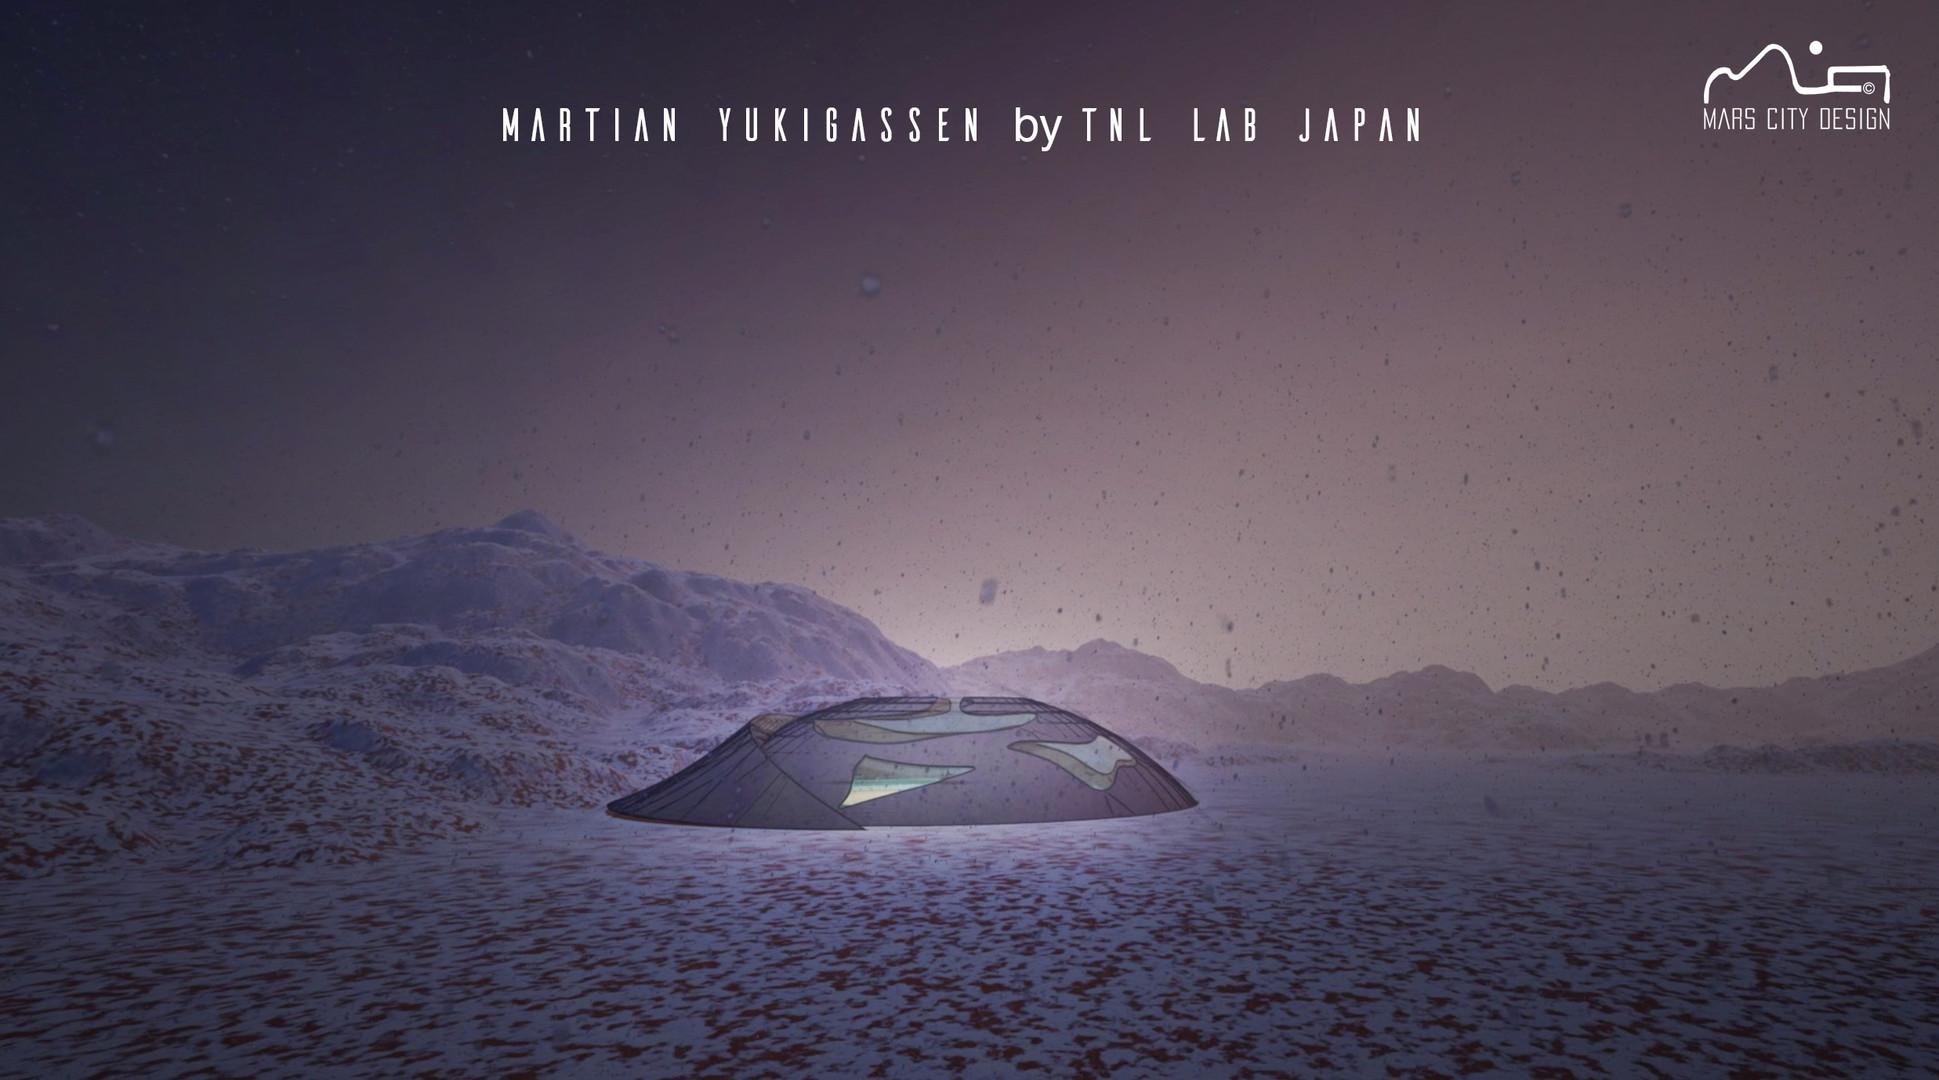 Martian Yukigassen